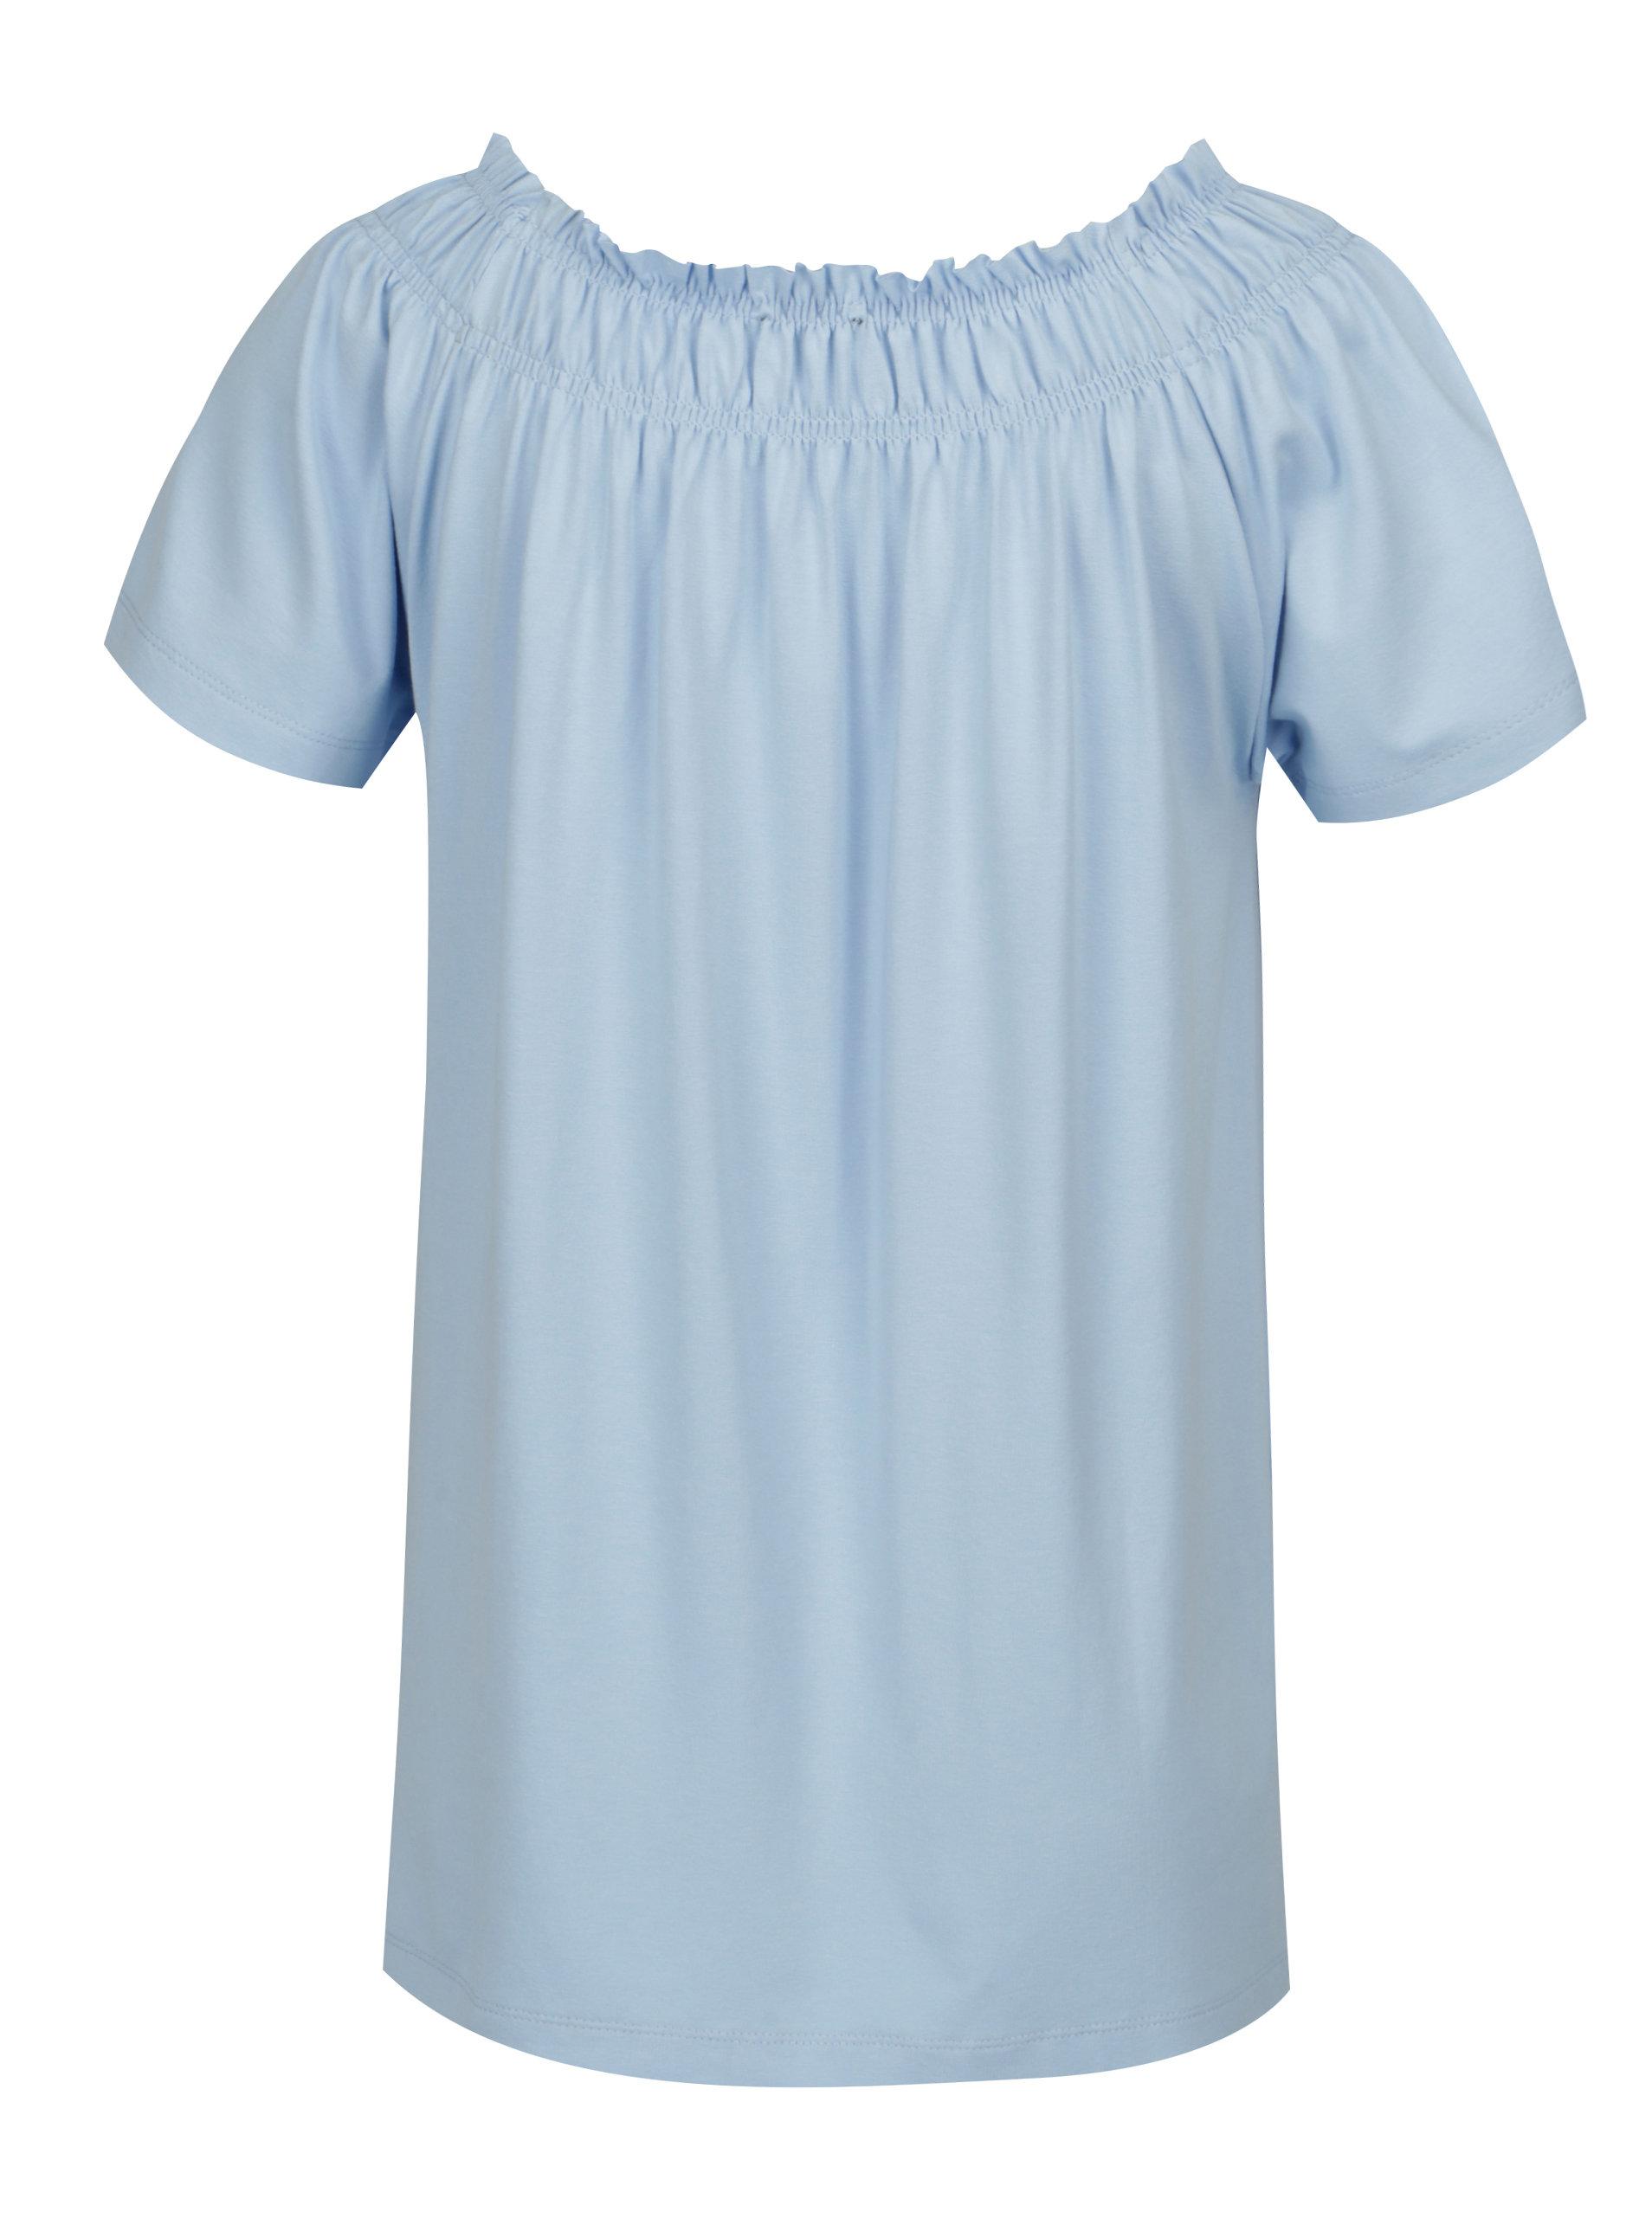 23c29b4d1a06 Modré tričko s krátkym rukávom Yest ...